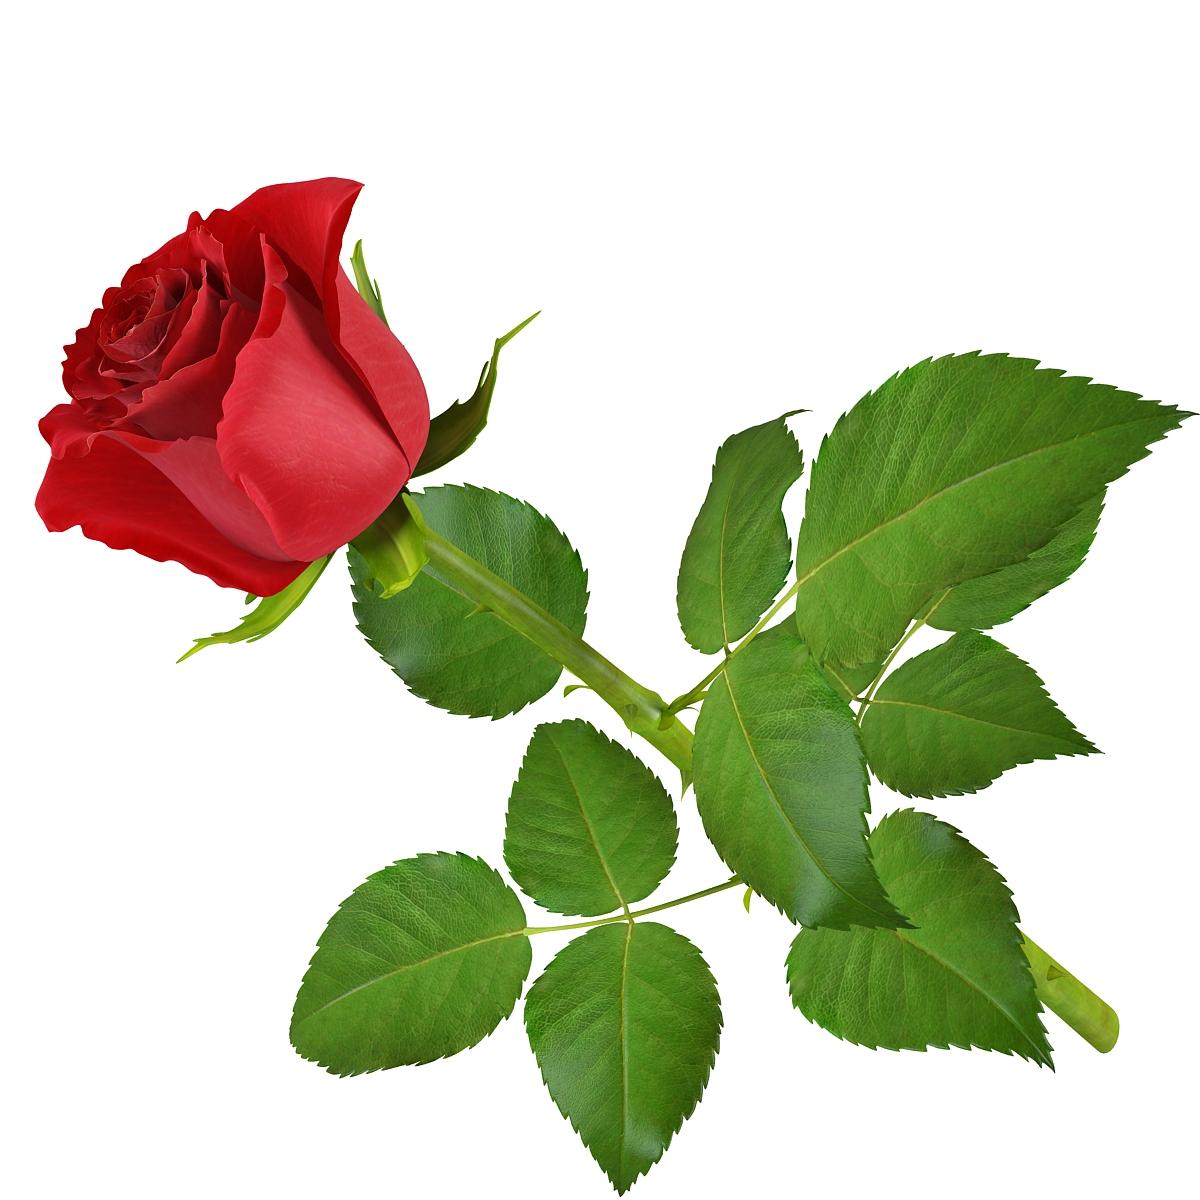 rose11 1 2 - Lovly Red Rose